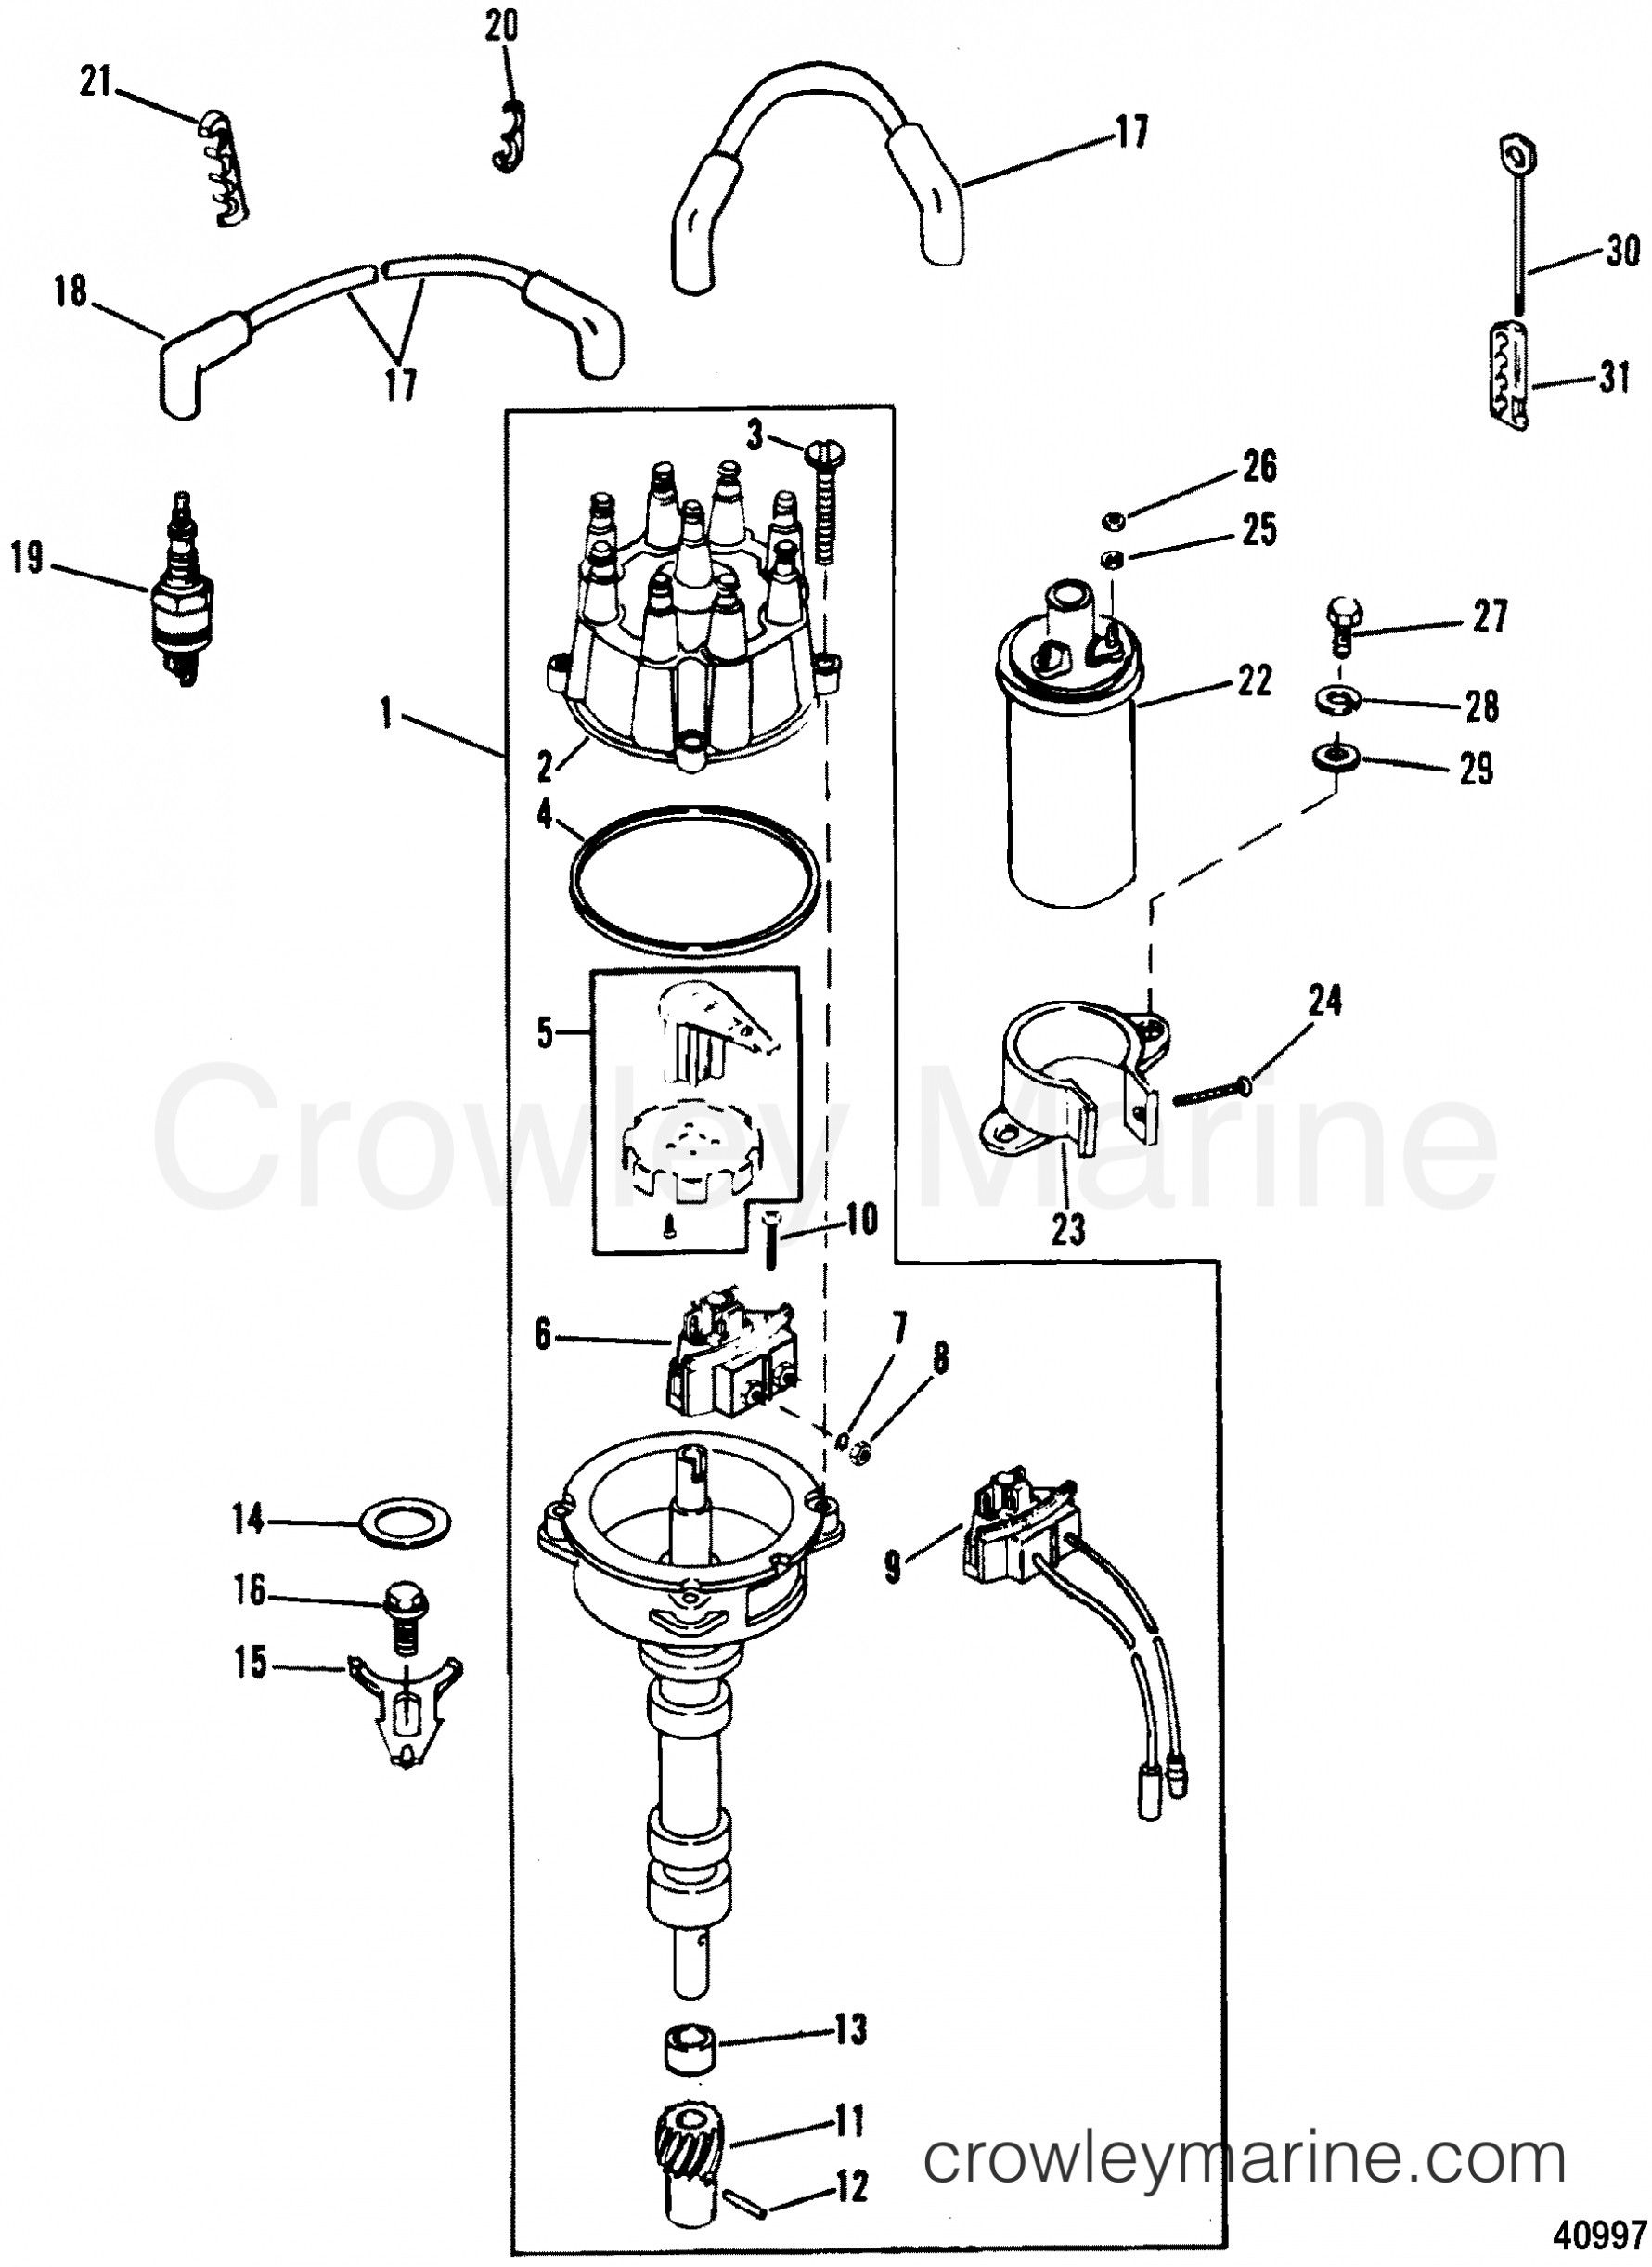 hight resolution of hiniker plow light diagrams service manual library in hiniker plow wiring diagram